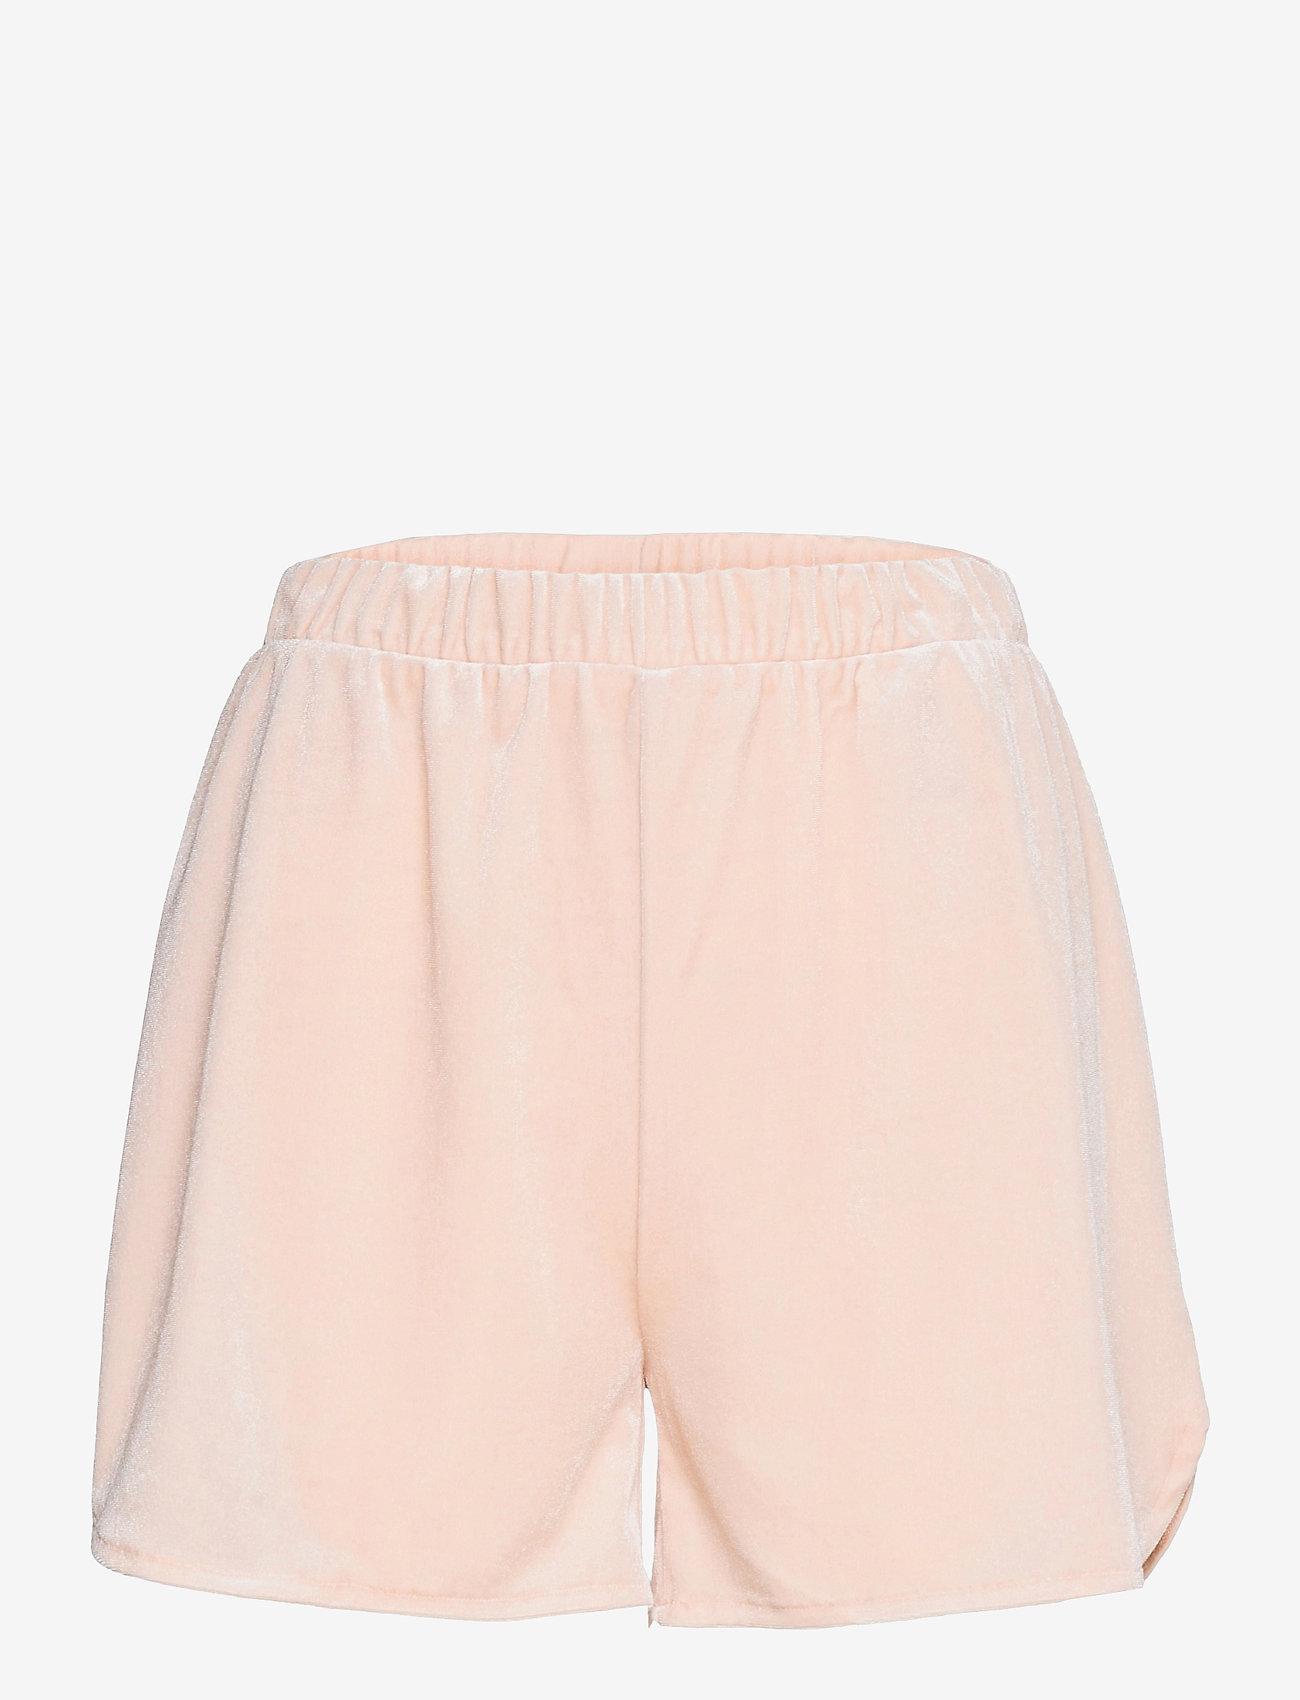 Vila - VIVELVETTA RW SHORTS - shorts casual - peach blush - 0